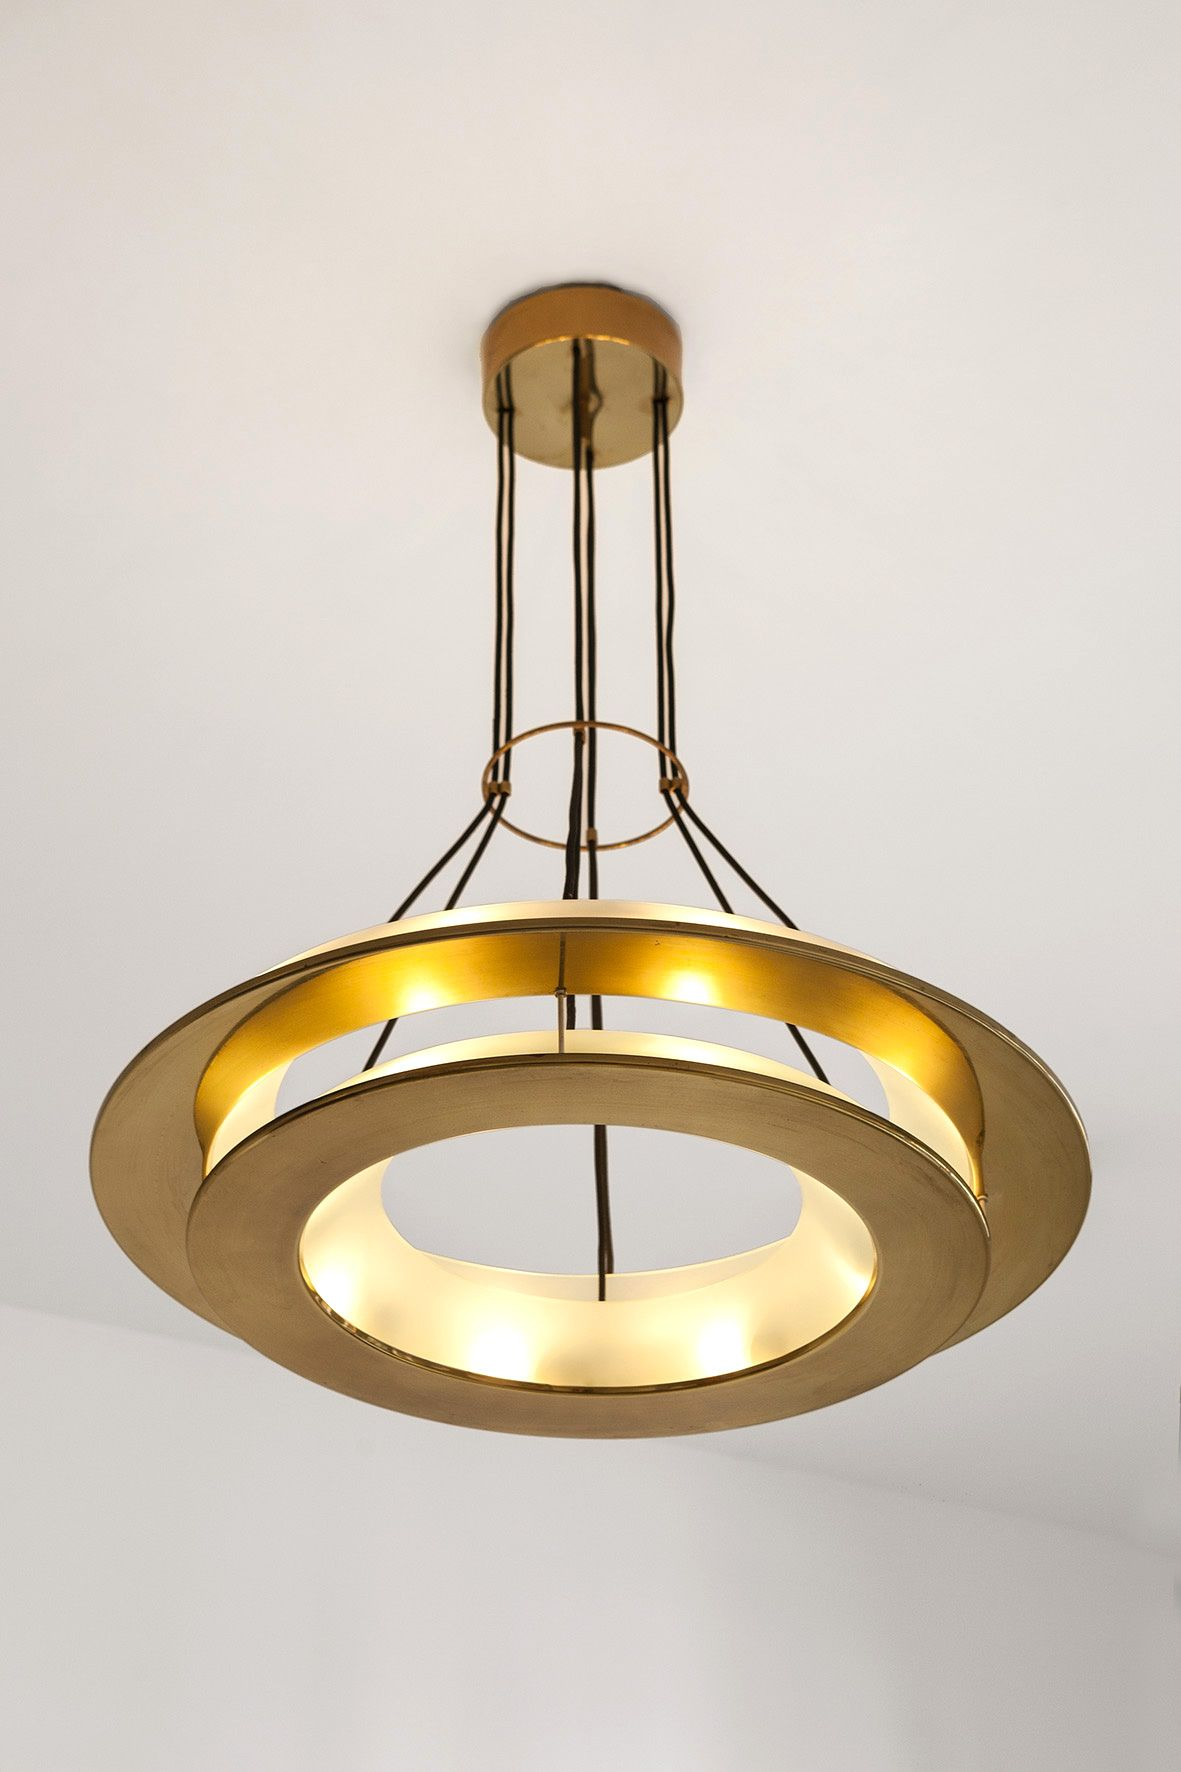 Mod. 2295 Ceiling lamp   Ceiling lamp, Pendant ceiling lamp